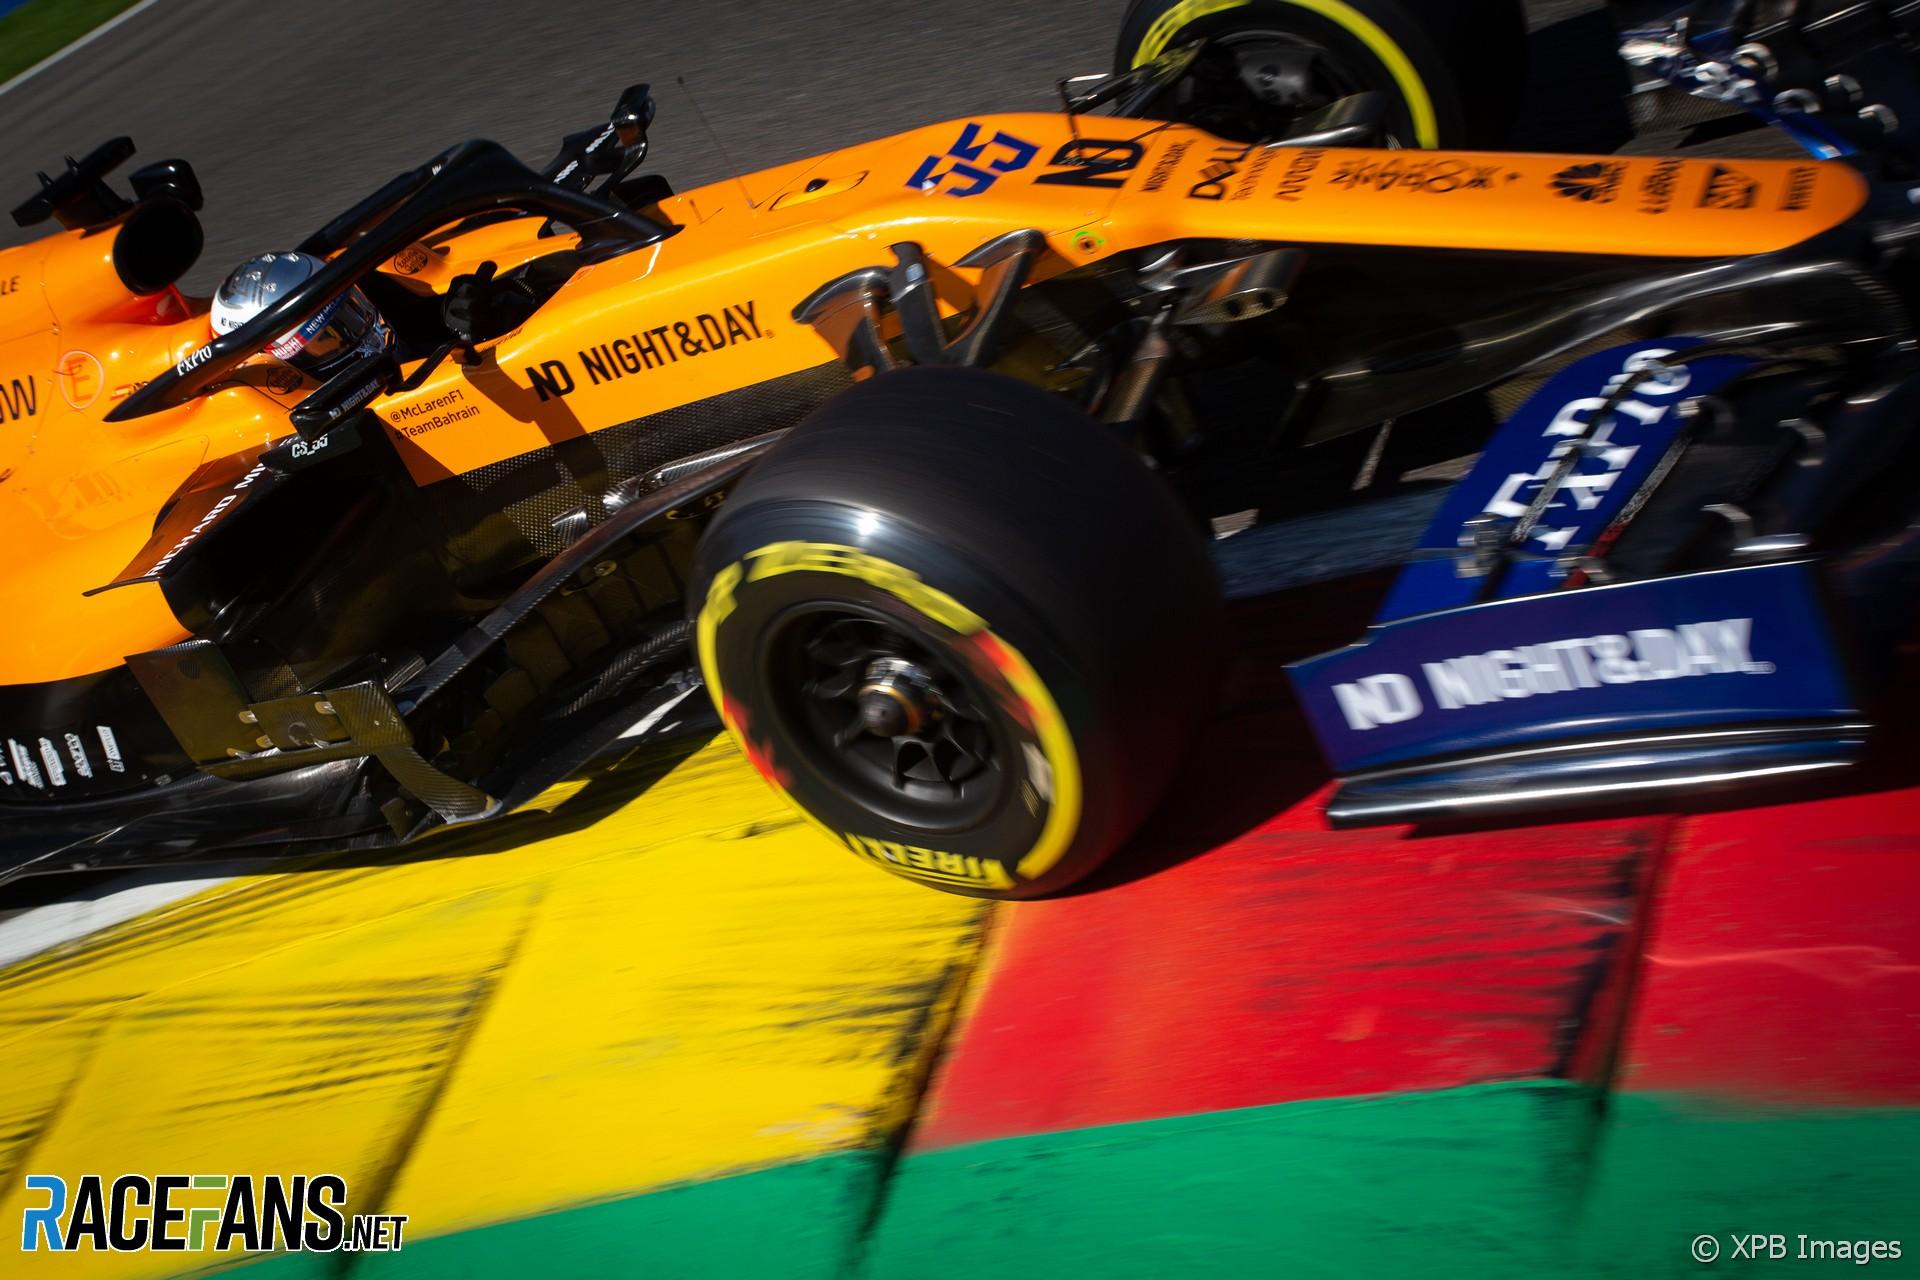 Carlos Sainz Jnr, McLaren, Spa-Francorchamps, 2019